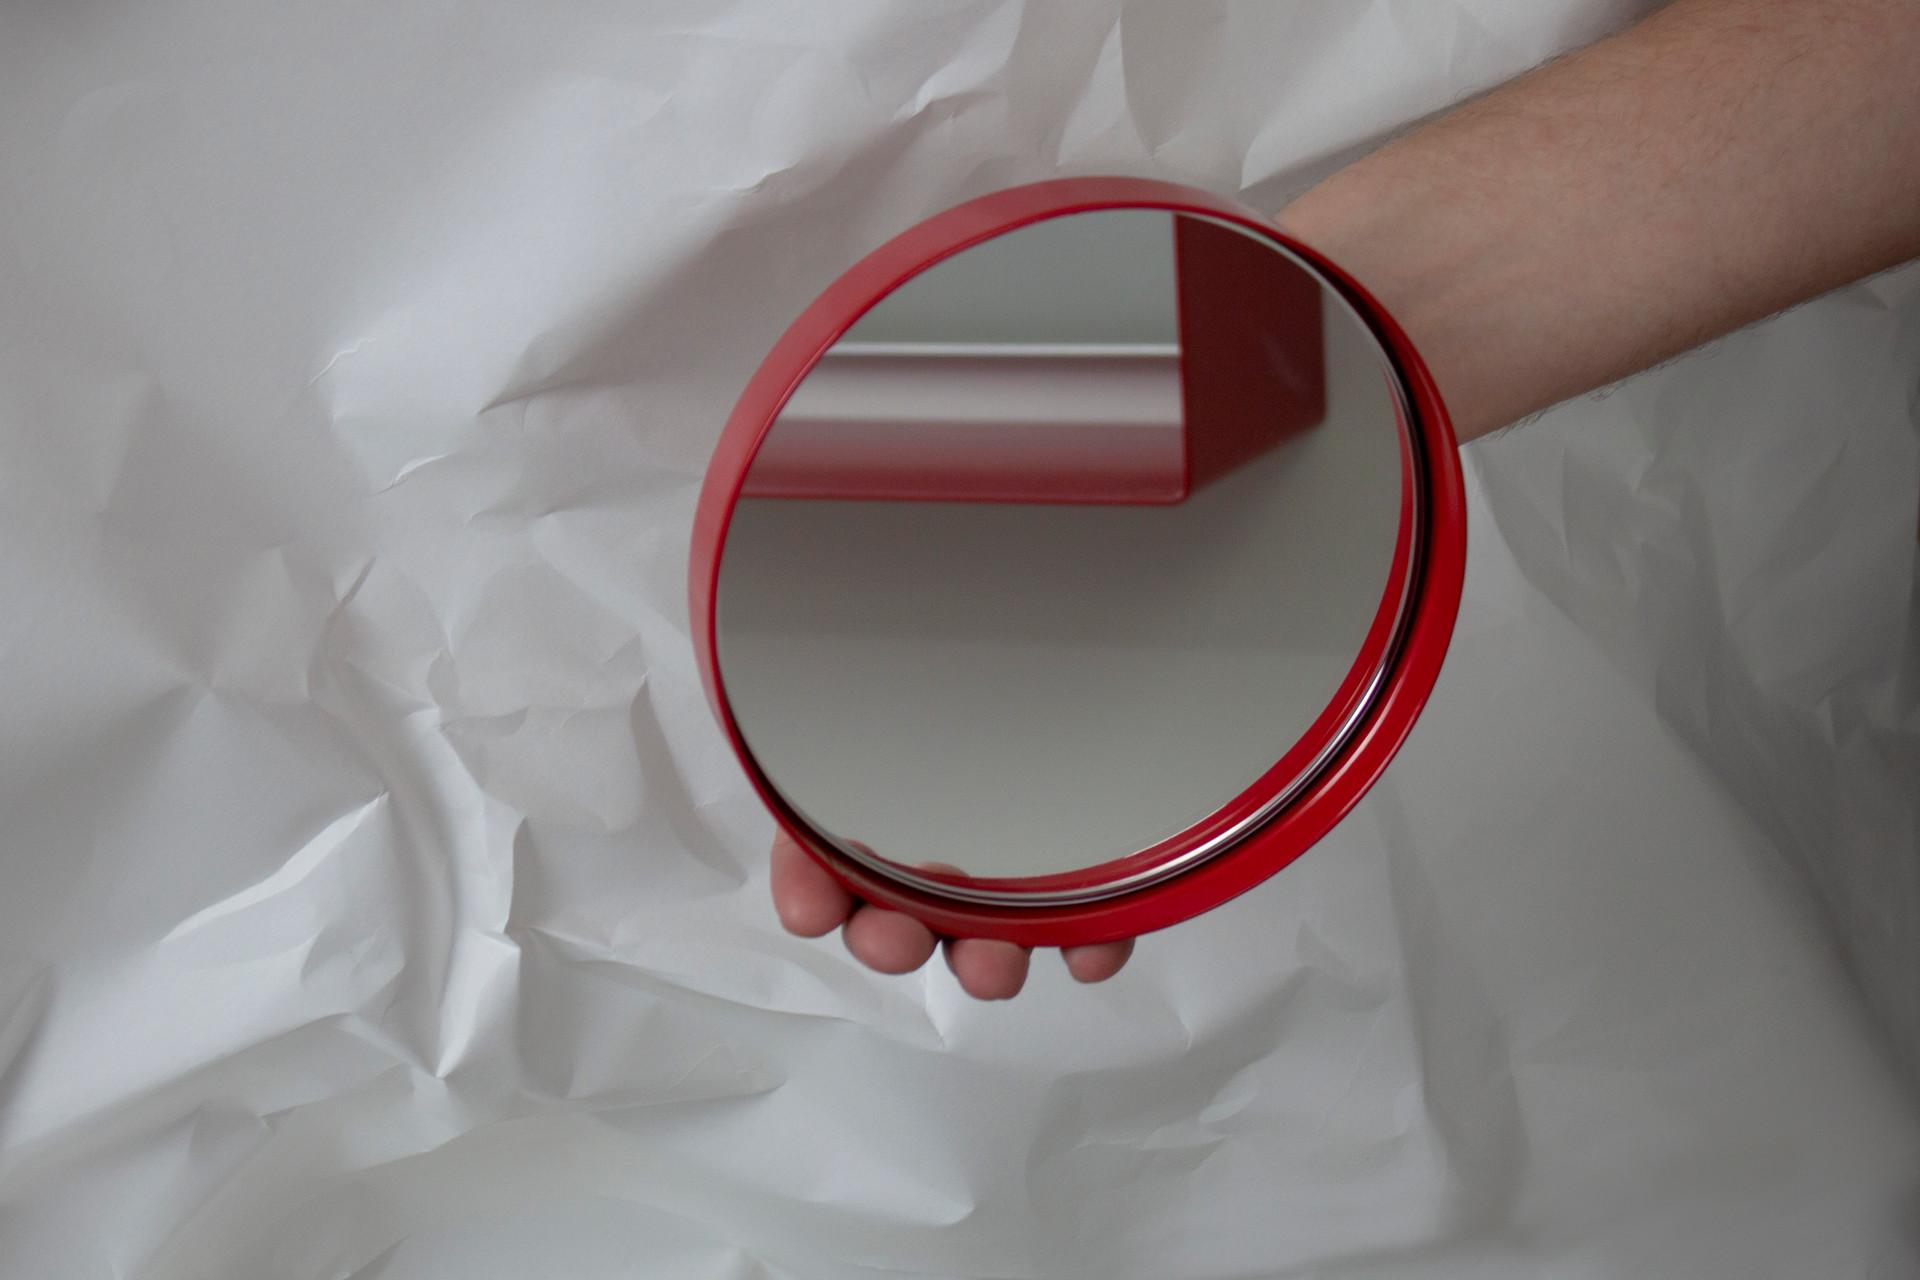 In Focus Handheld Mirror. Purchase through JamFactory